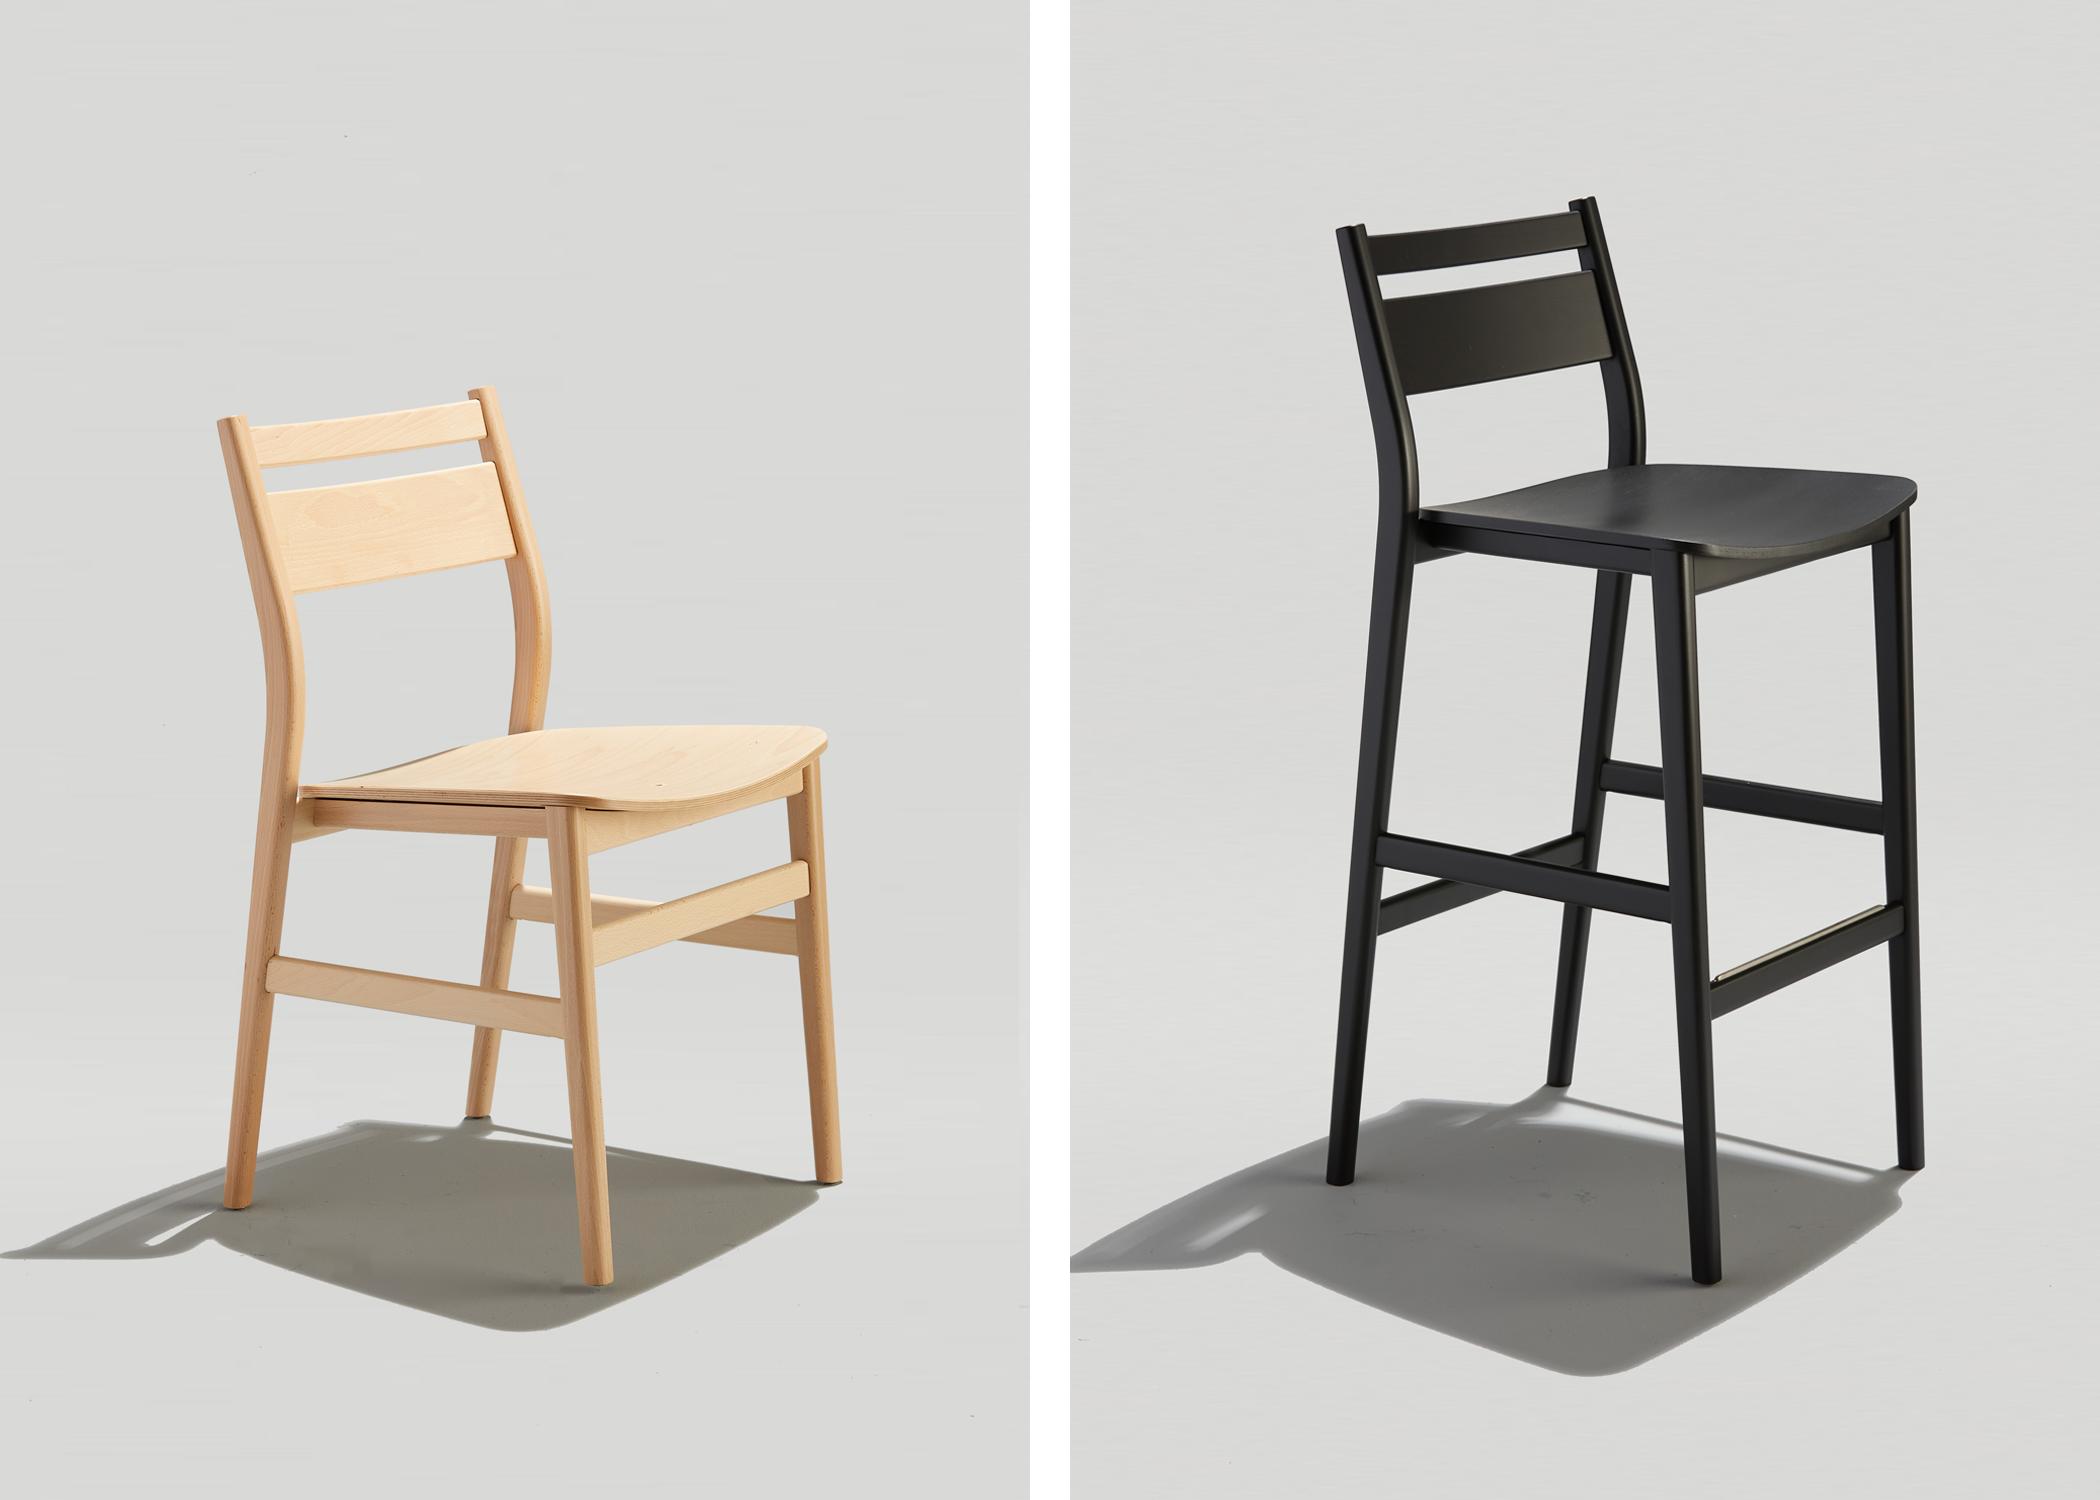 Sigsbee_Wood-Chair_Barstool